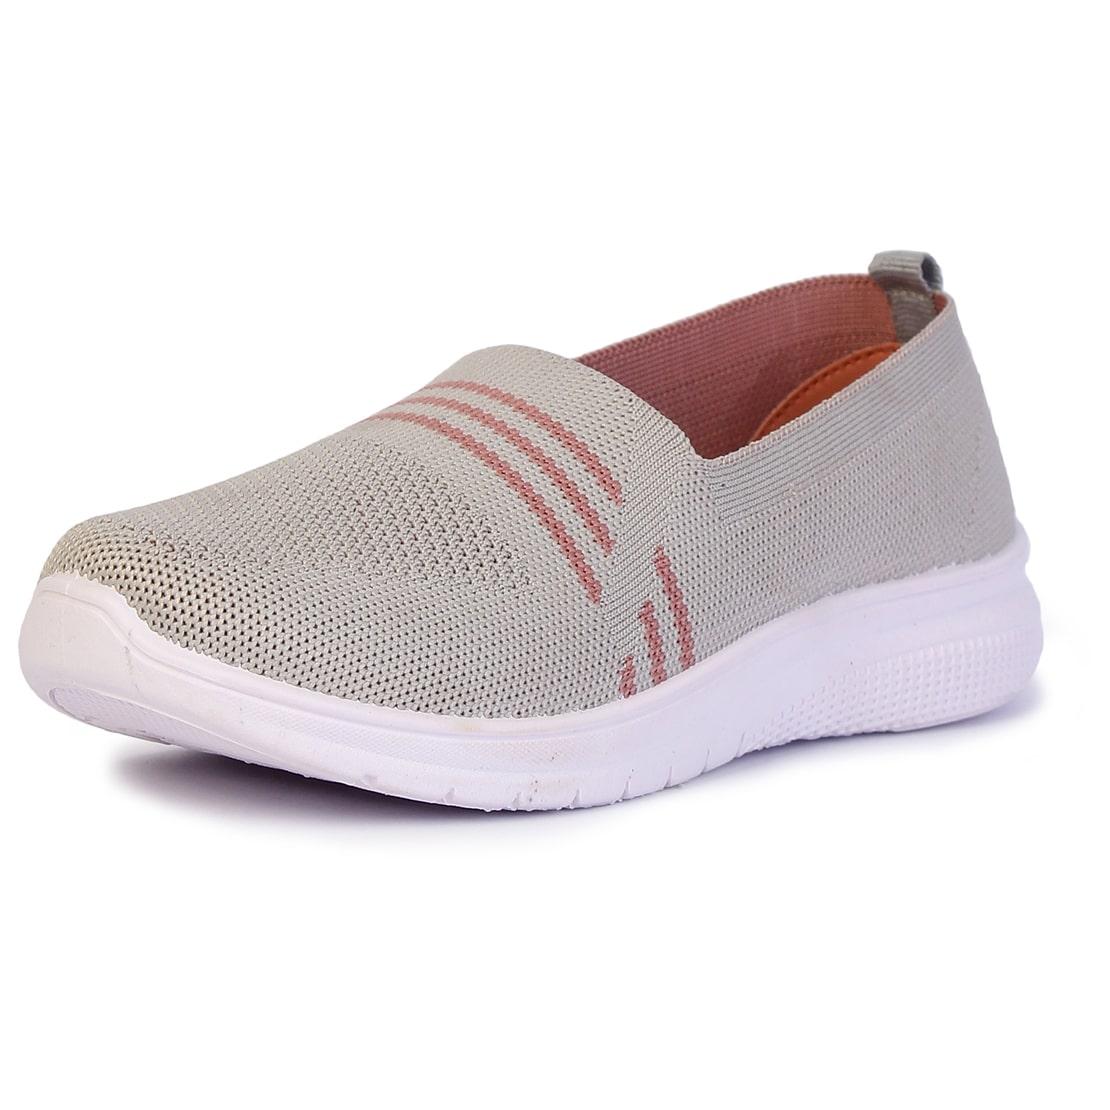 Lancer Sports Shoes Prices | Buy Lancer